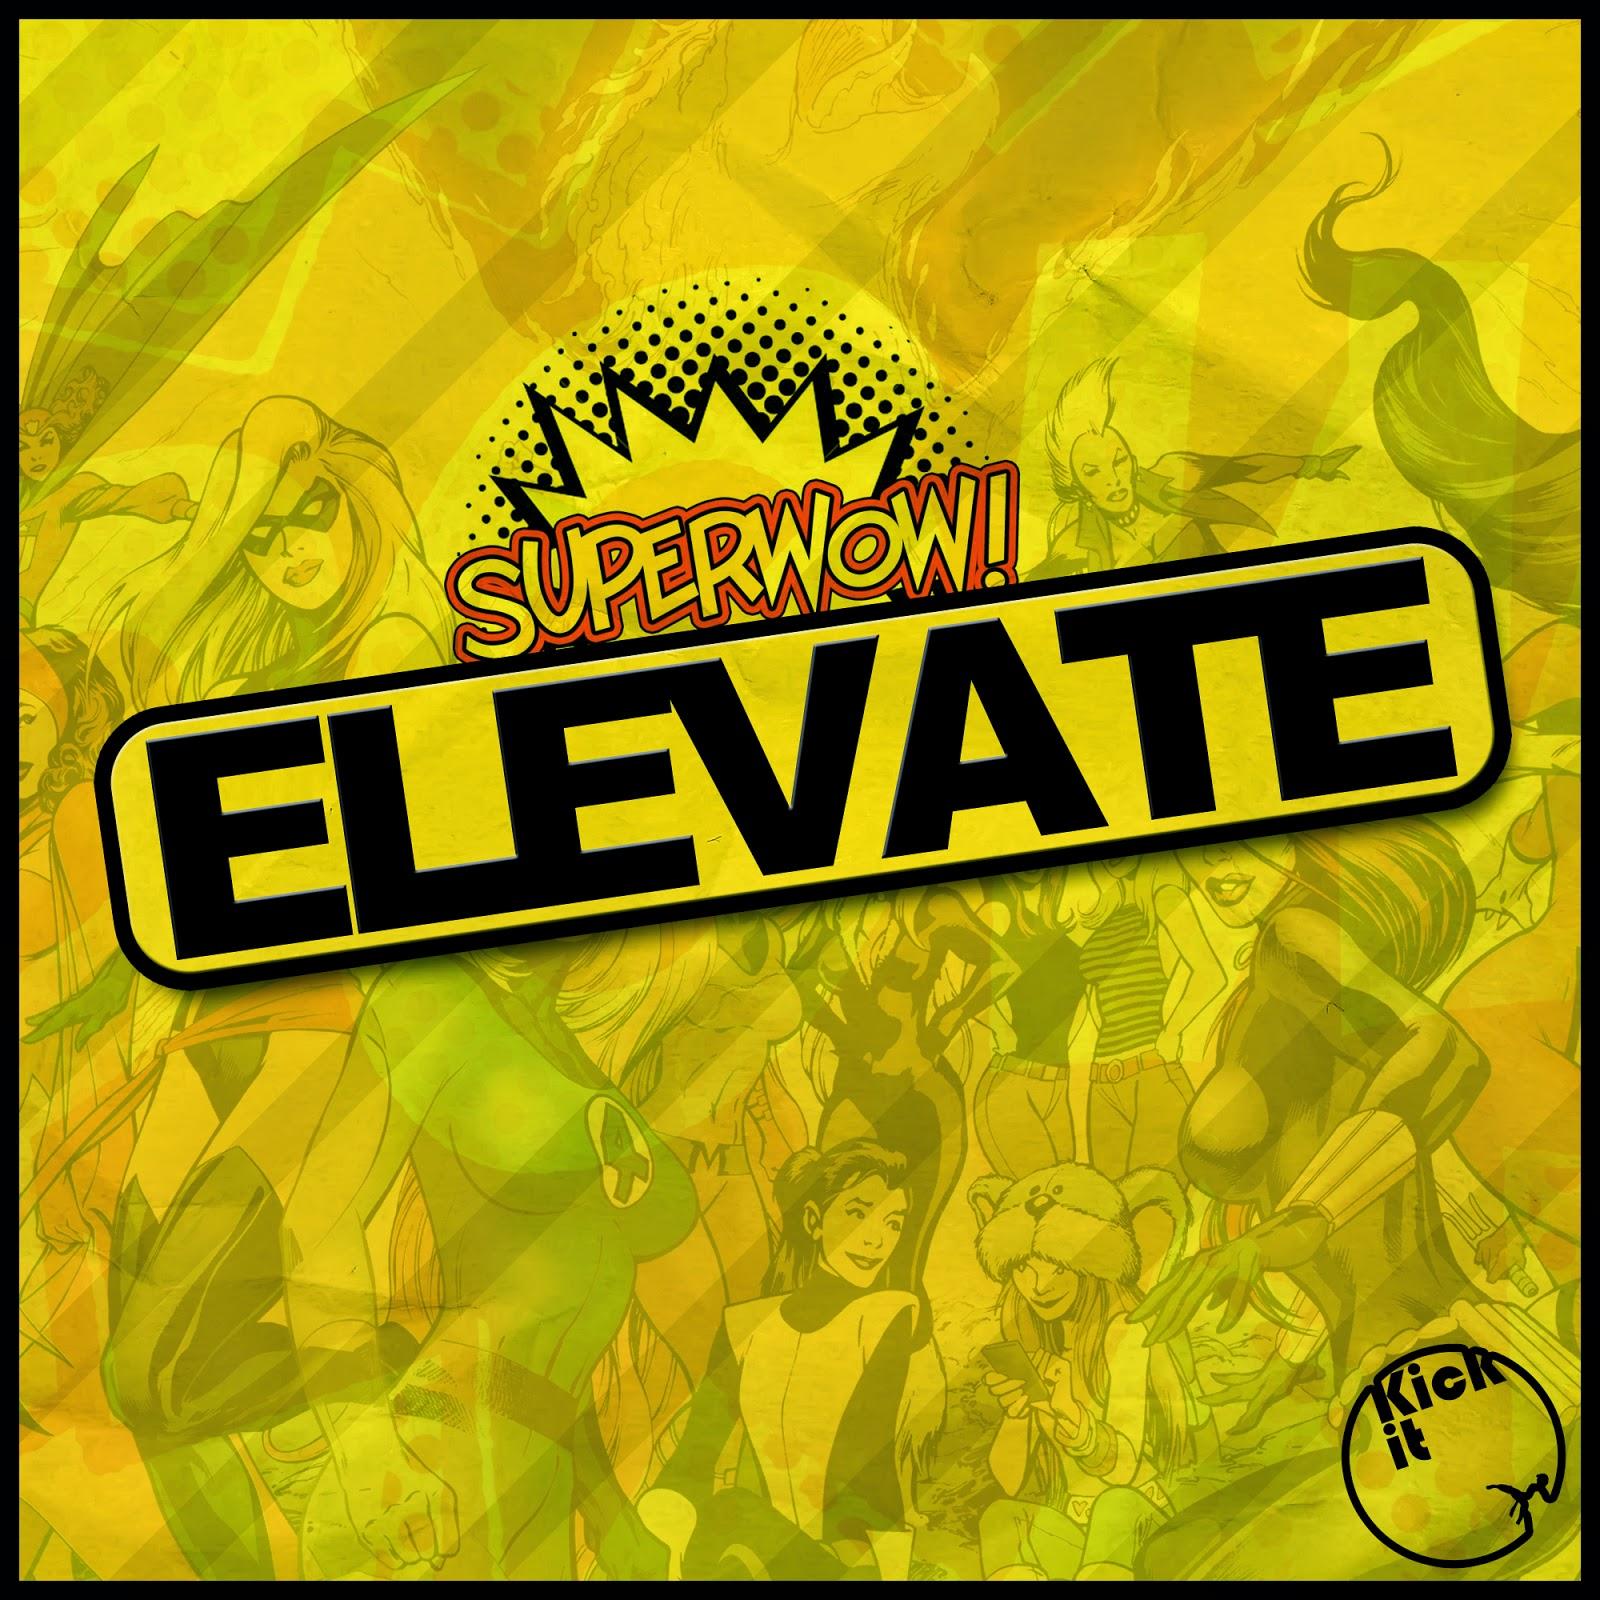 Superwow! - Elevate